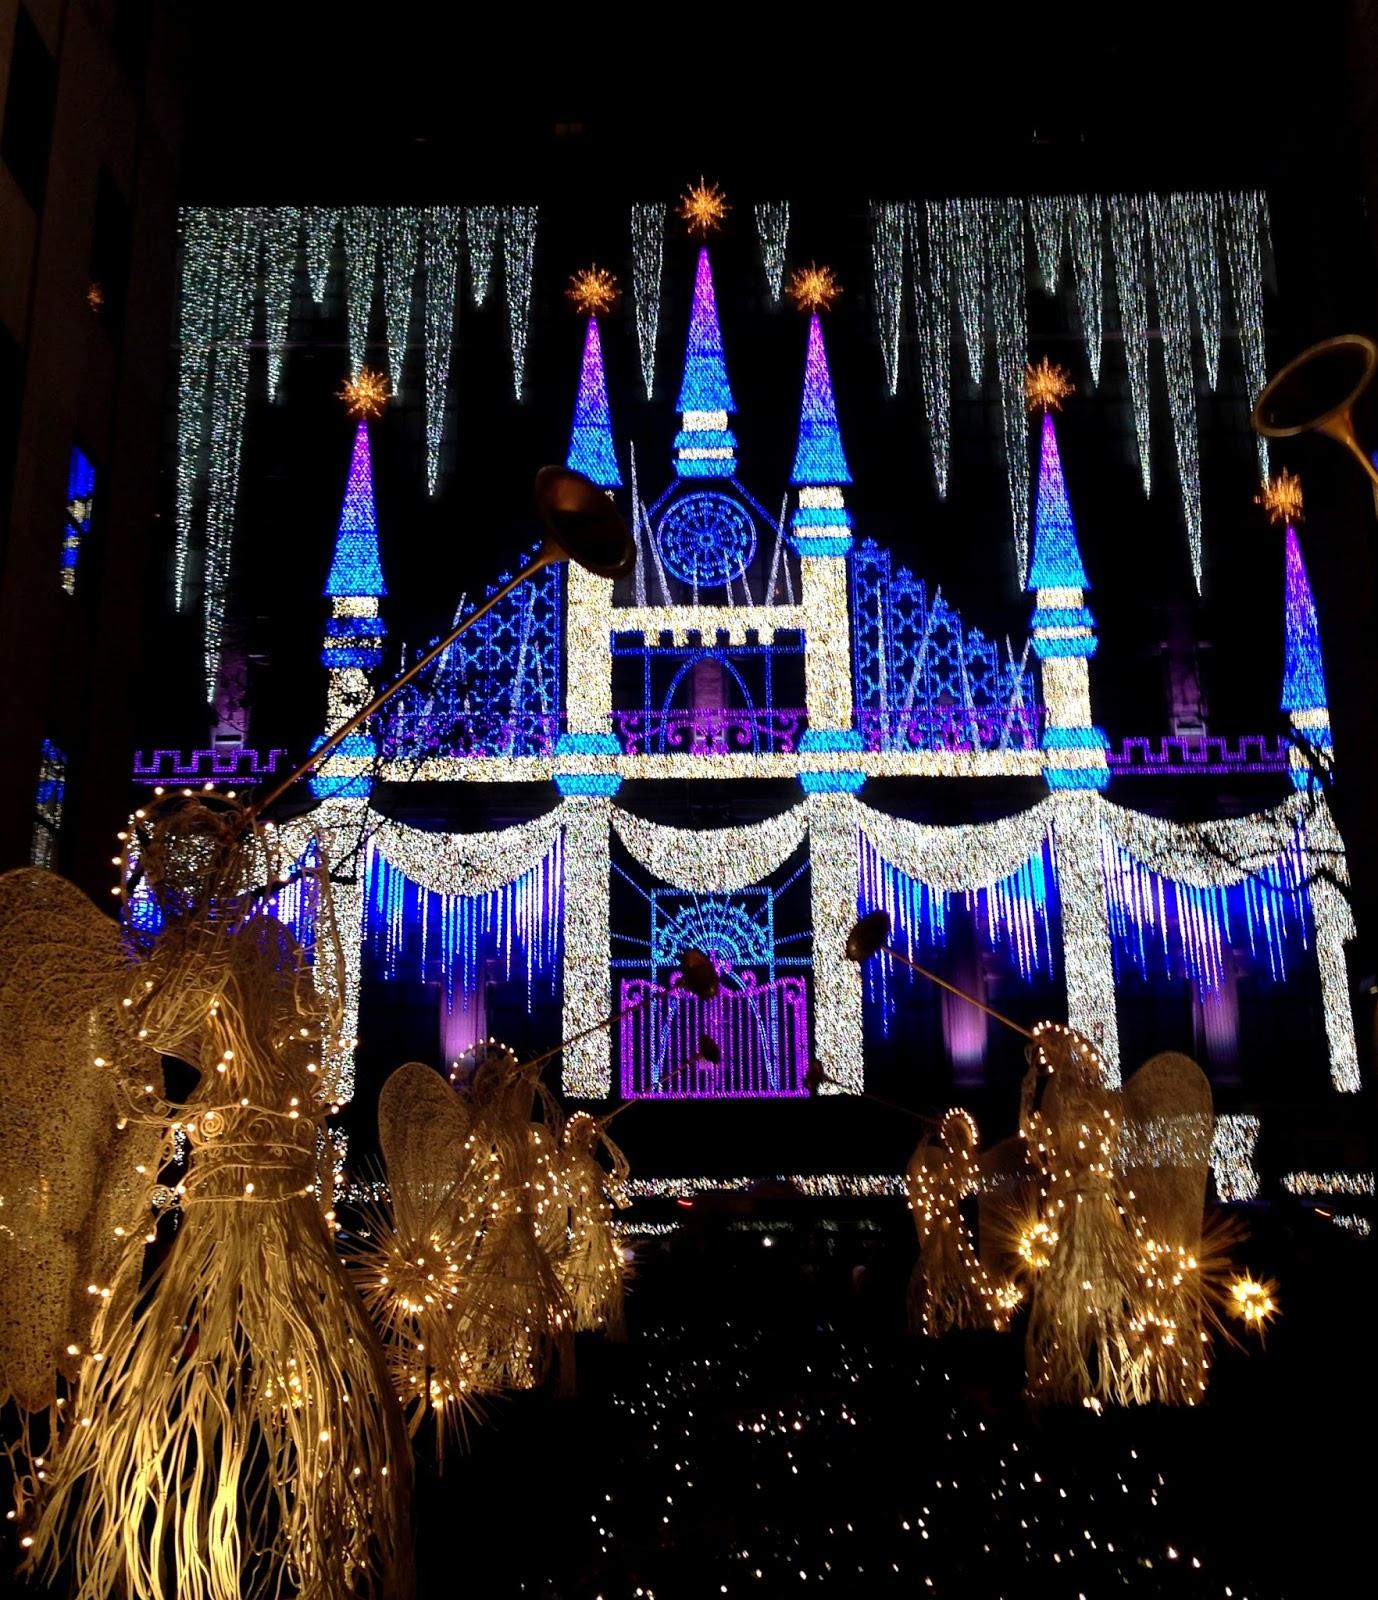 Good Saks Fifth Avenue Lights Show In Rockefeller Center, New York City Design Inspirations